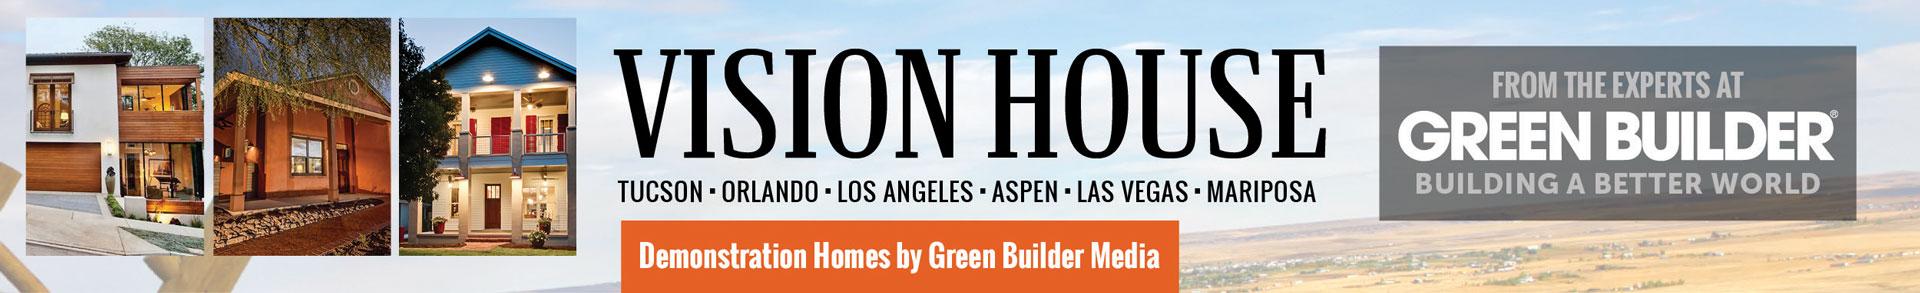 Green Builder Vision House Banner